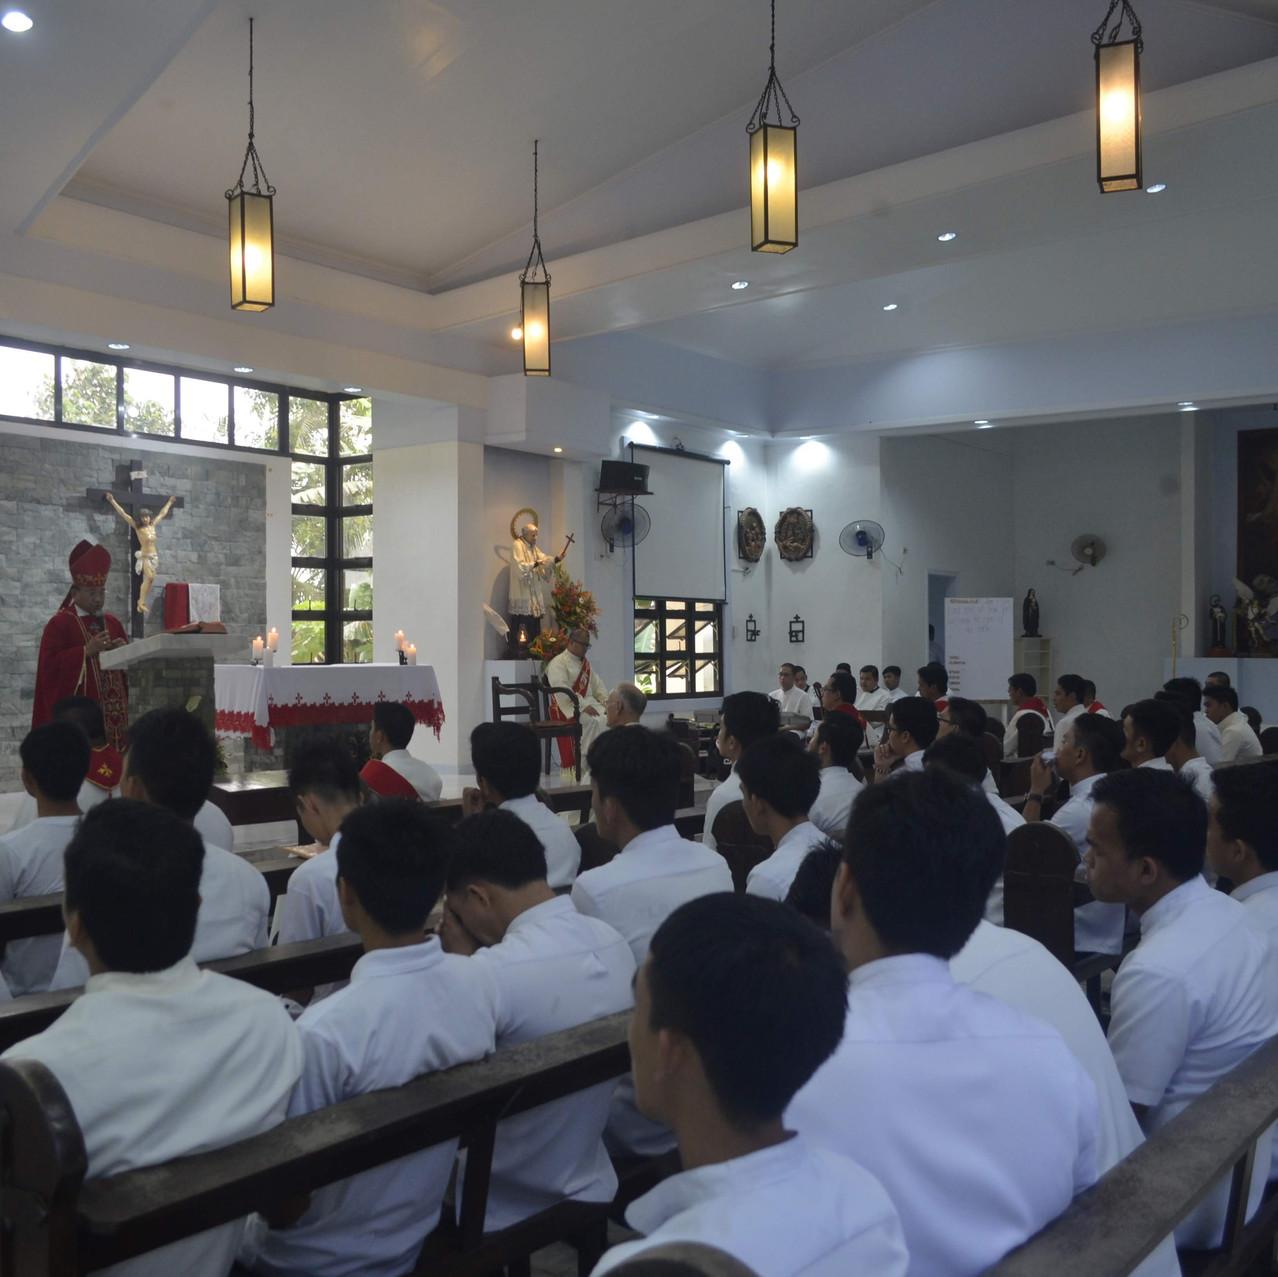 2018-06-11 - Calbayog City - Holy Spirit Mass (3)